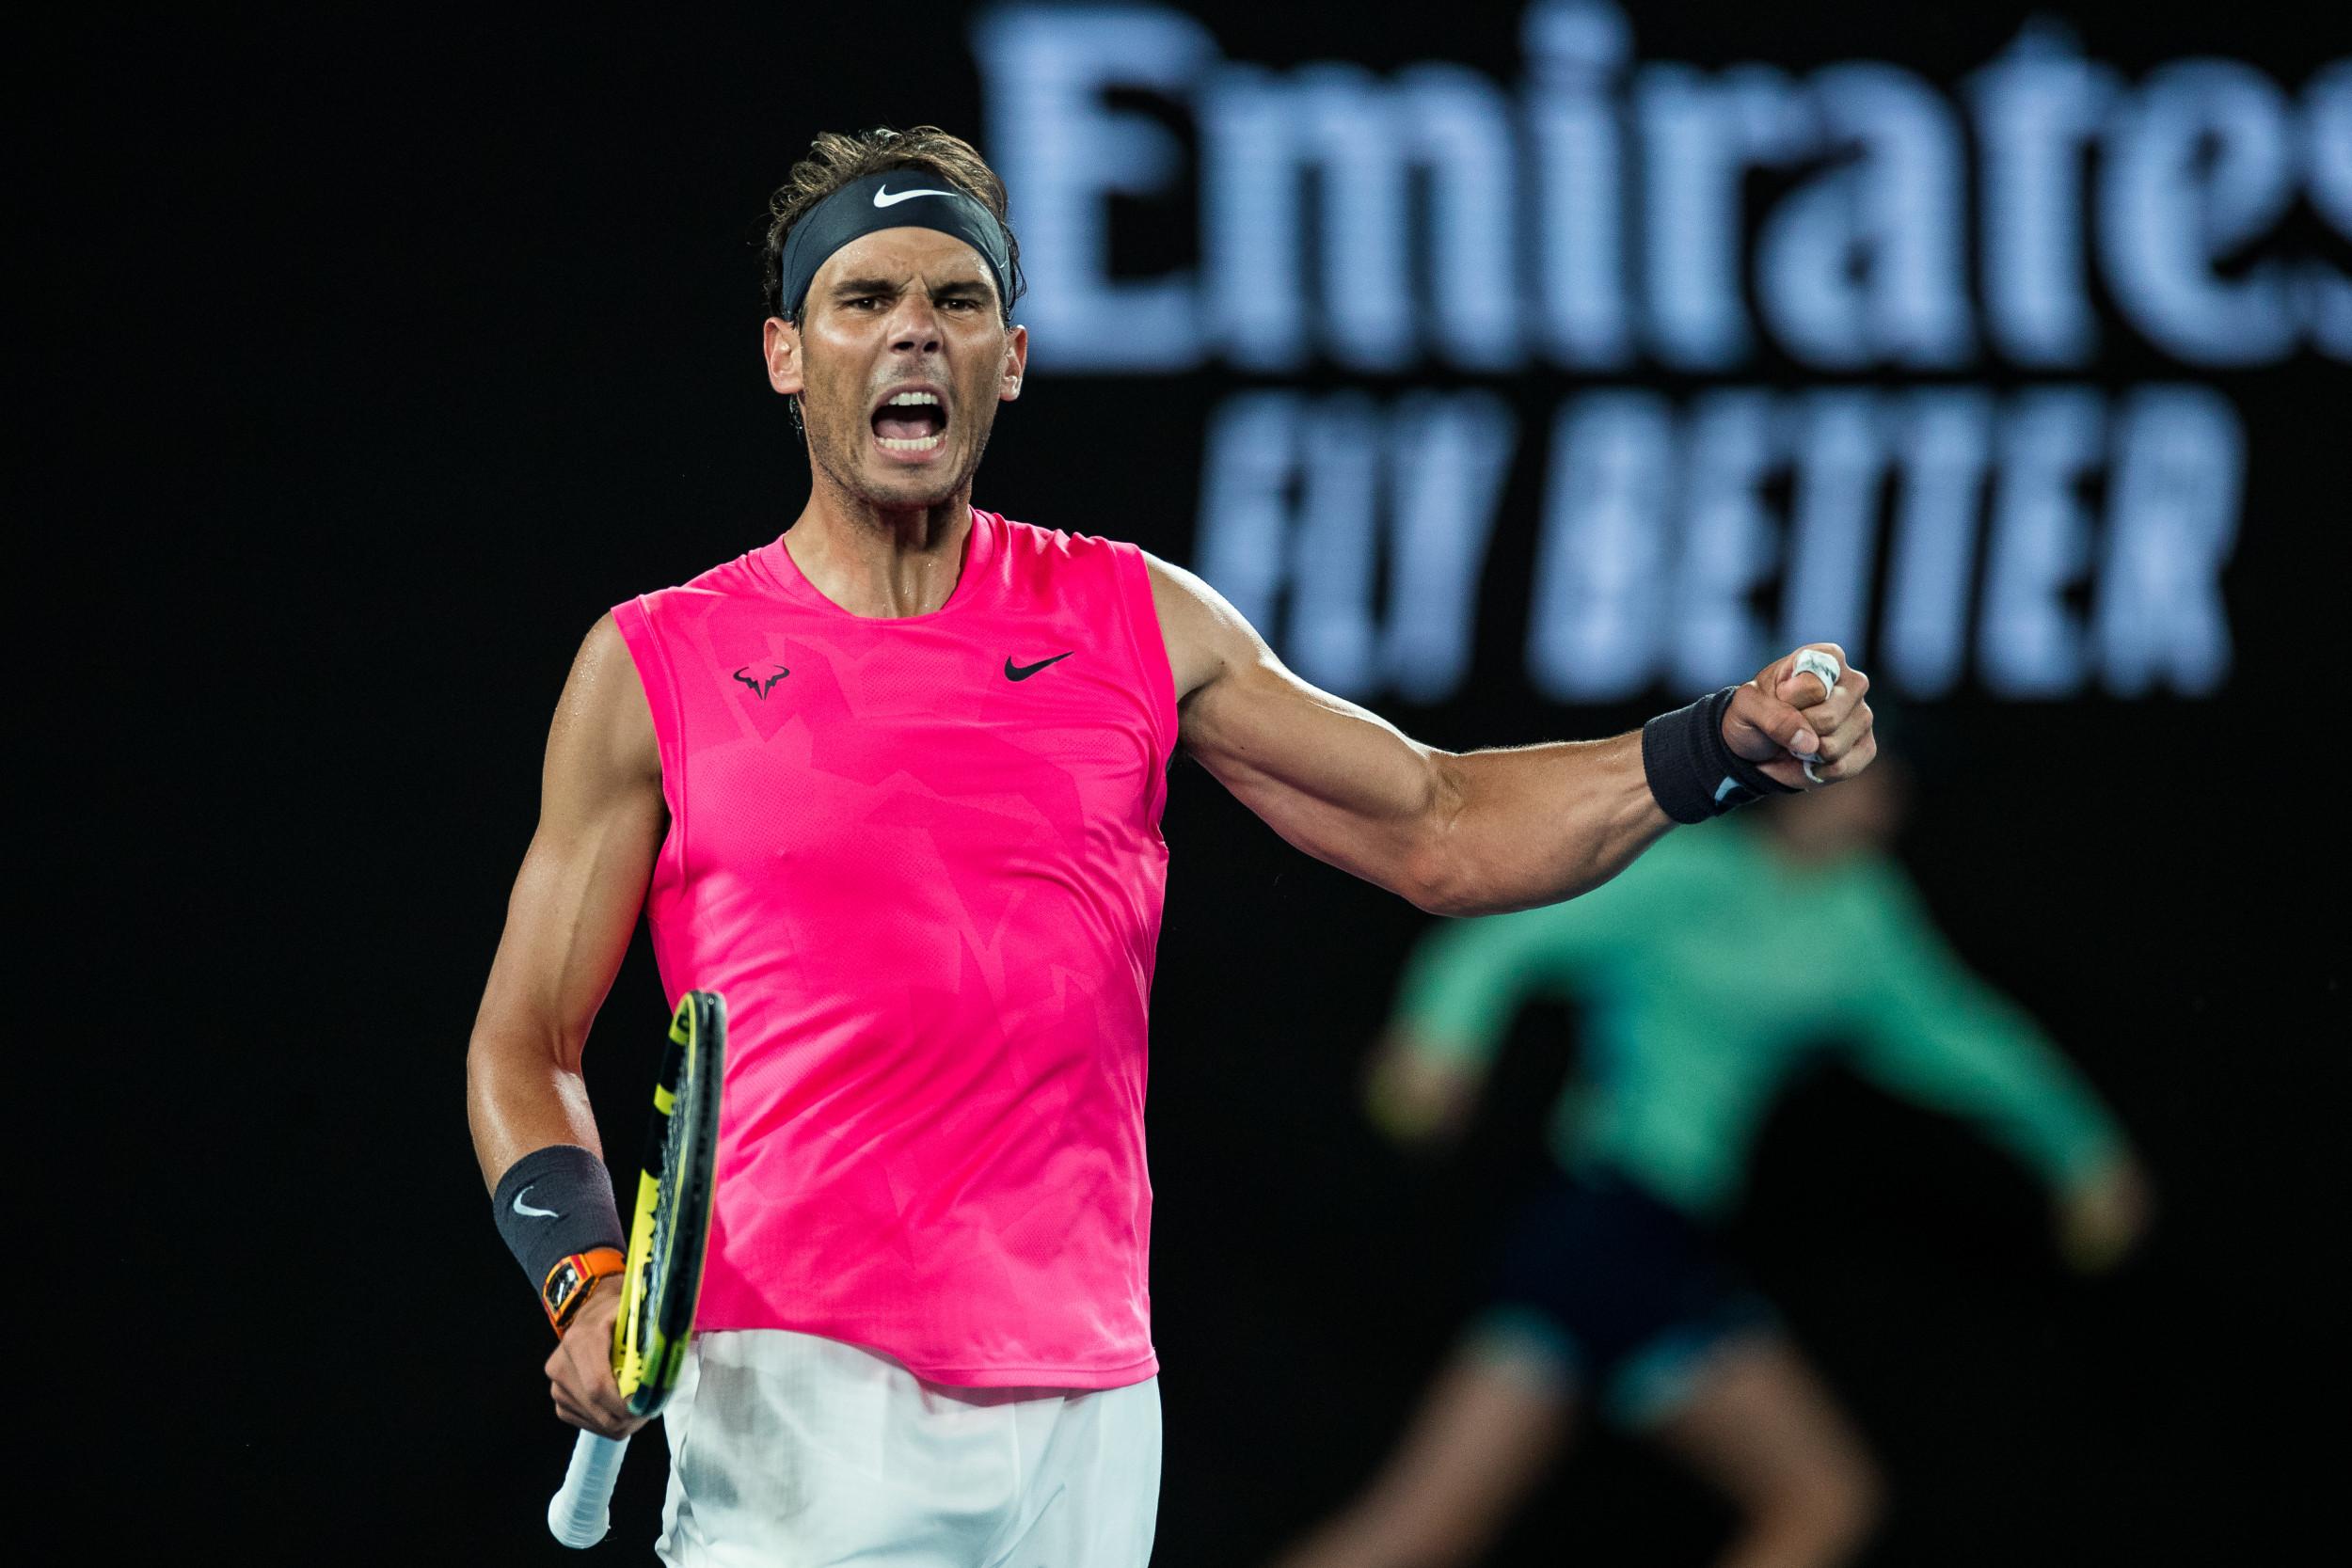 Rafael Nadal bate Nick Kyrgios e avança no Australian Open